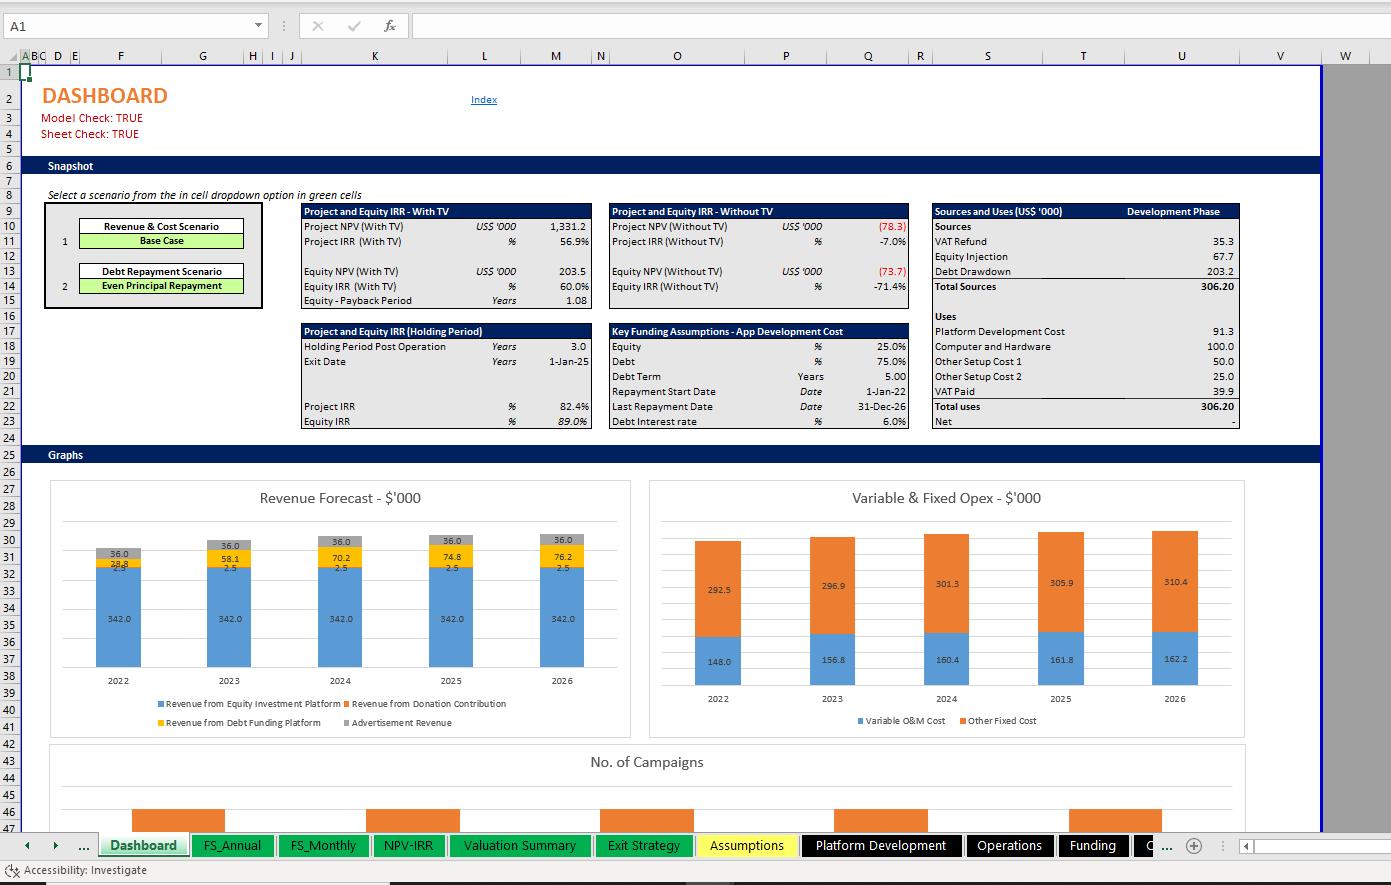 Business Plan - Crowdfunding Platform